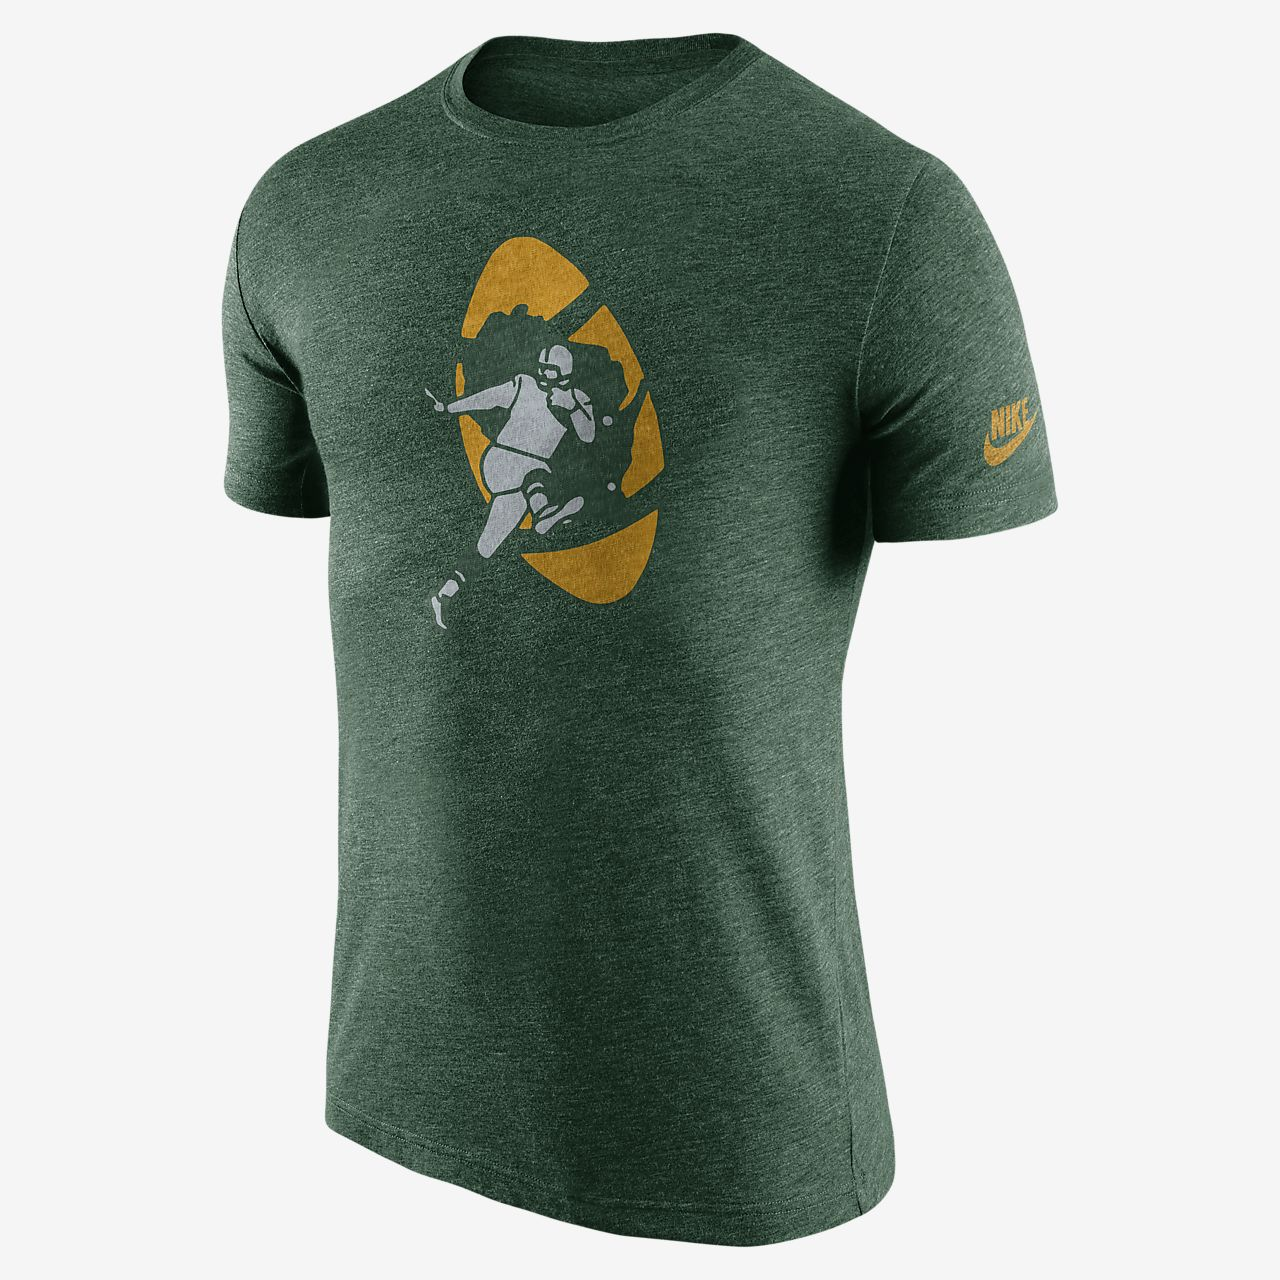 ... Nike Historic Logo (NFL Packers) Men's T-Shirt